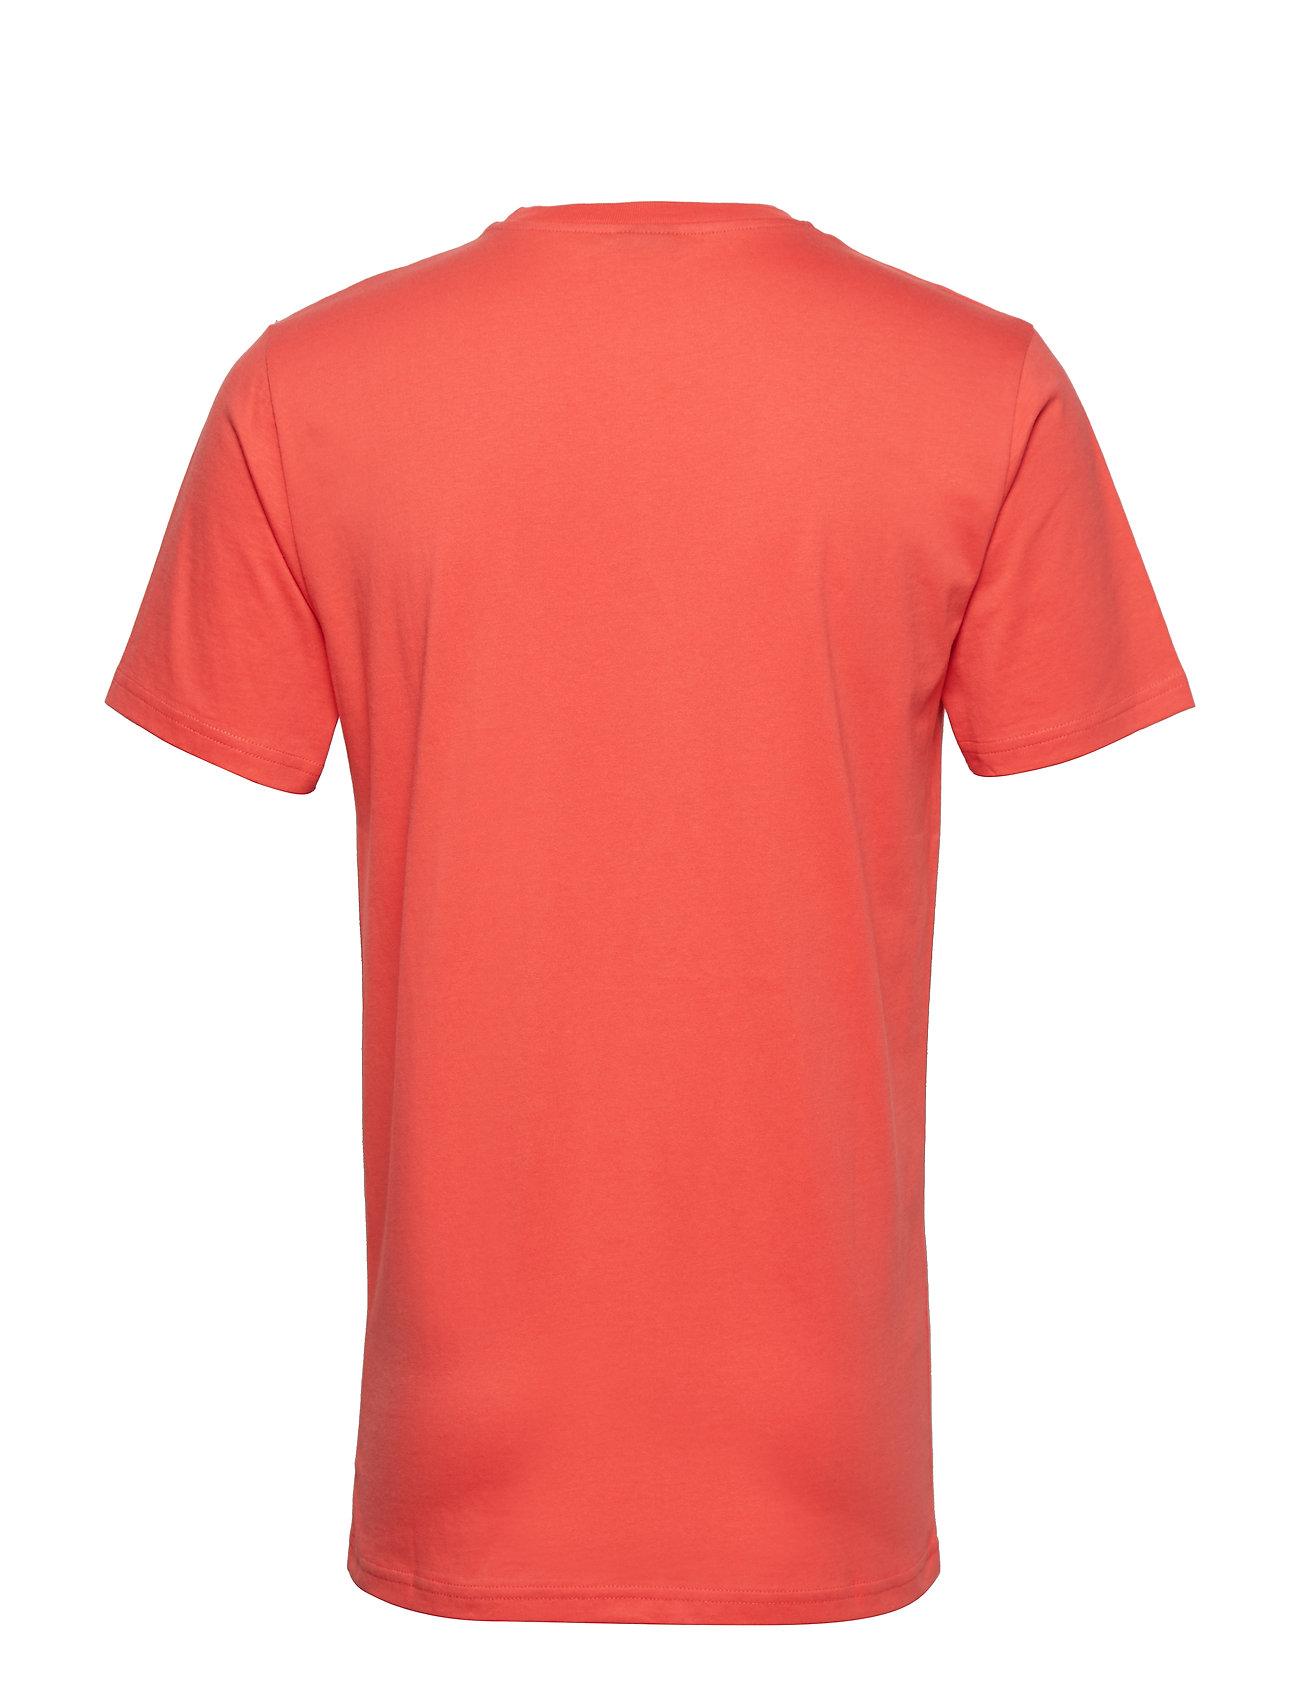 Starter St Charles Hot Coral / Black - T-shirts